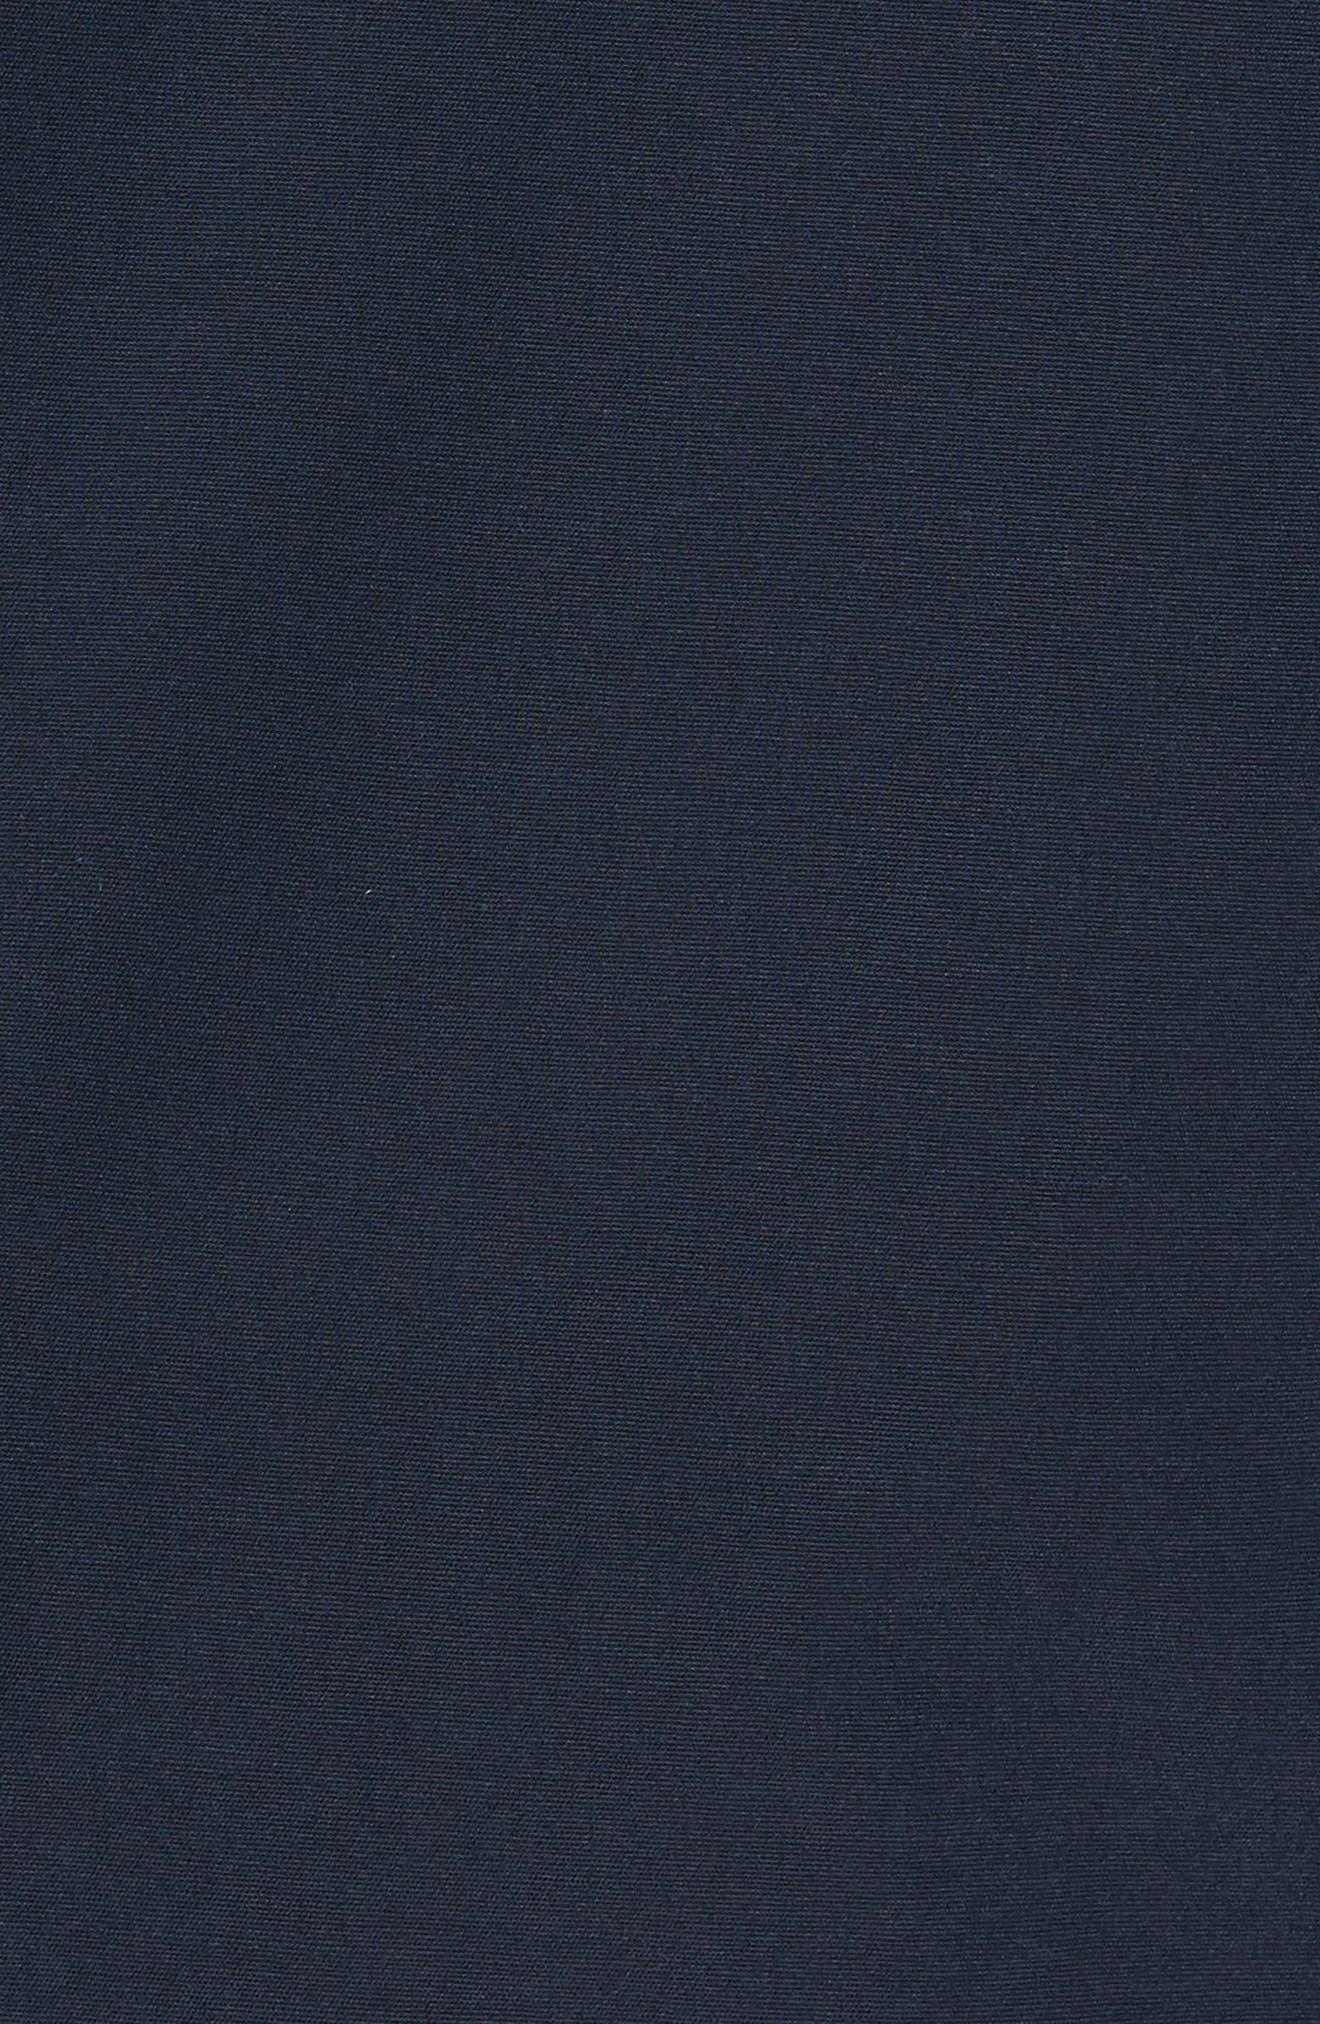 Elliot Bomber Jacket,                             Alternate thumbnail 6, color,                             Midnight Moon